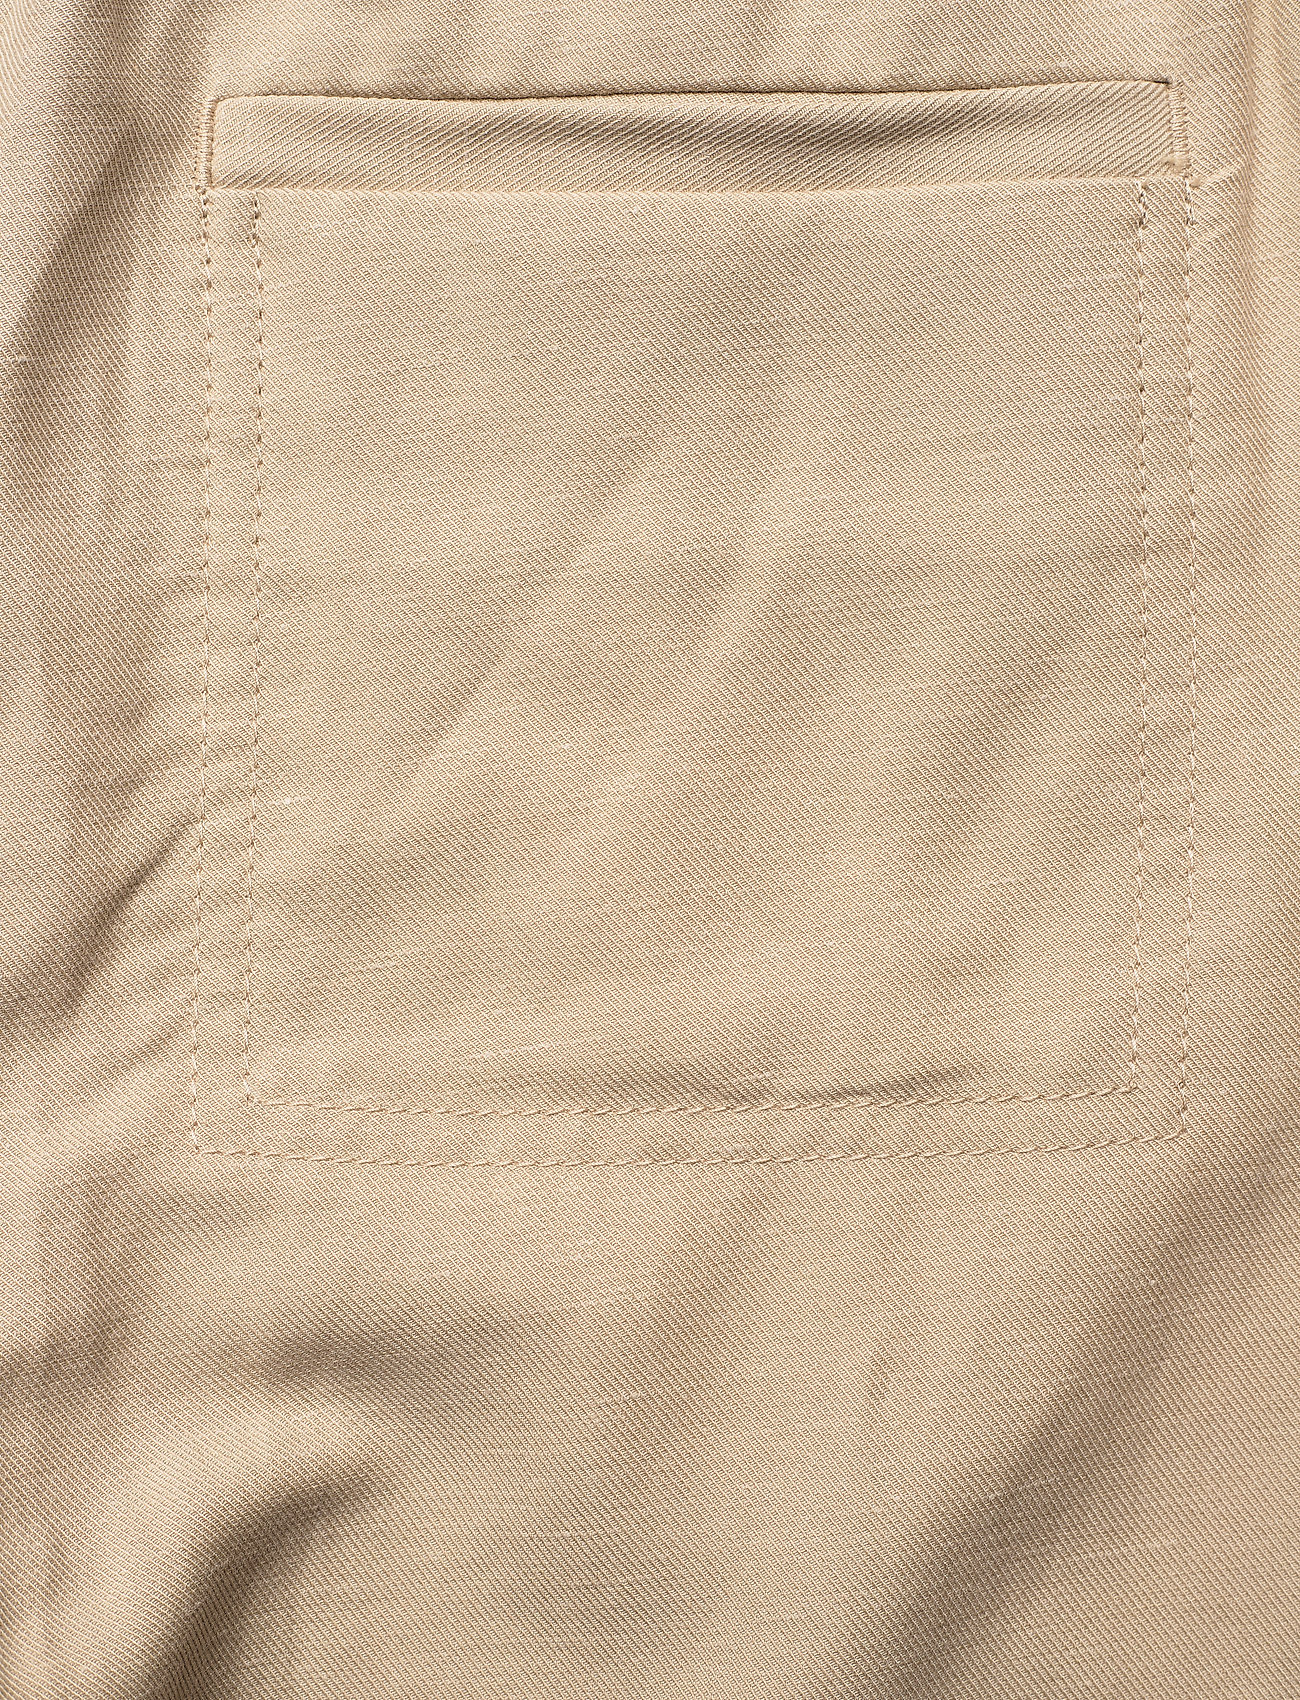 Banana Republic - Slim TENCEL™-Linen Pant - casual trousers - khaki - 4